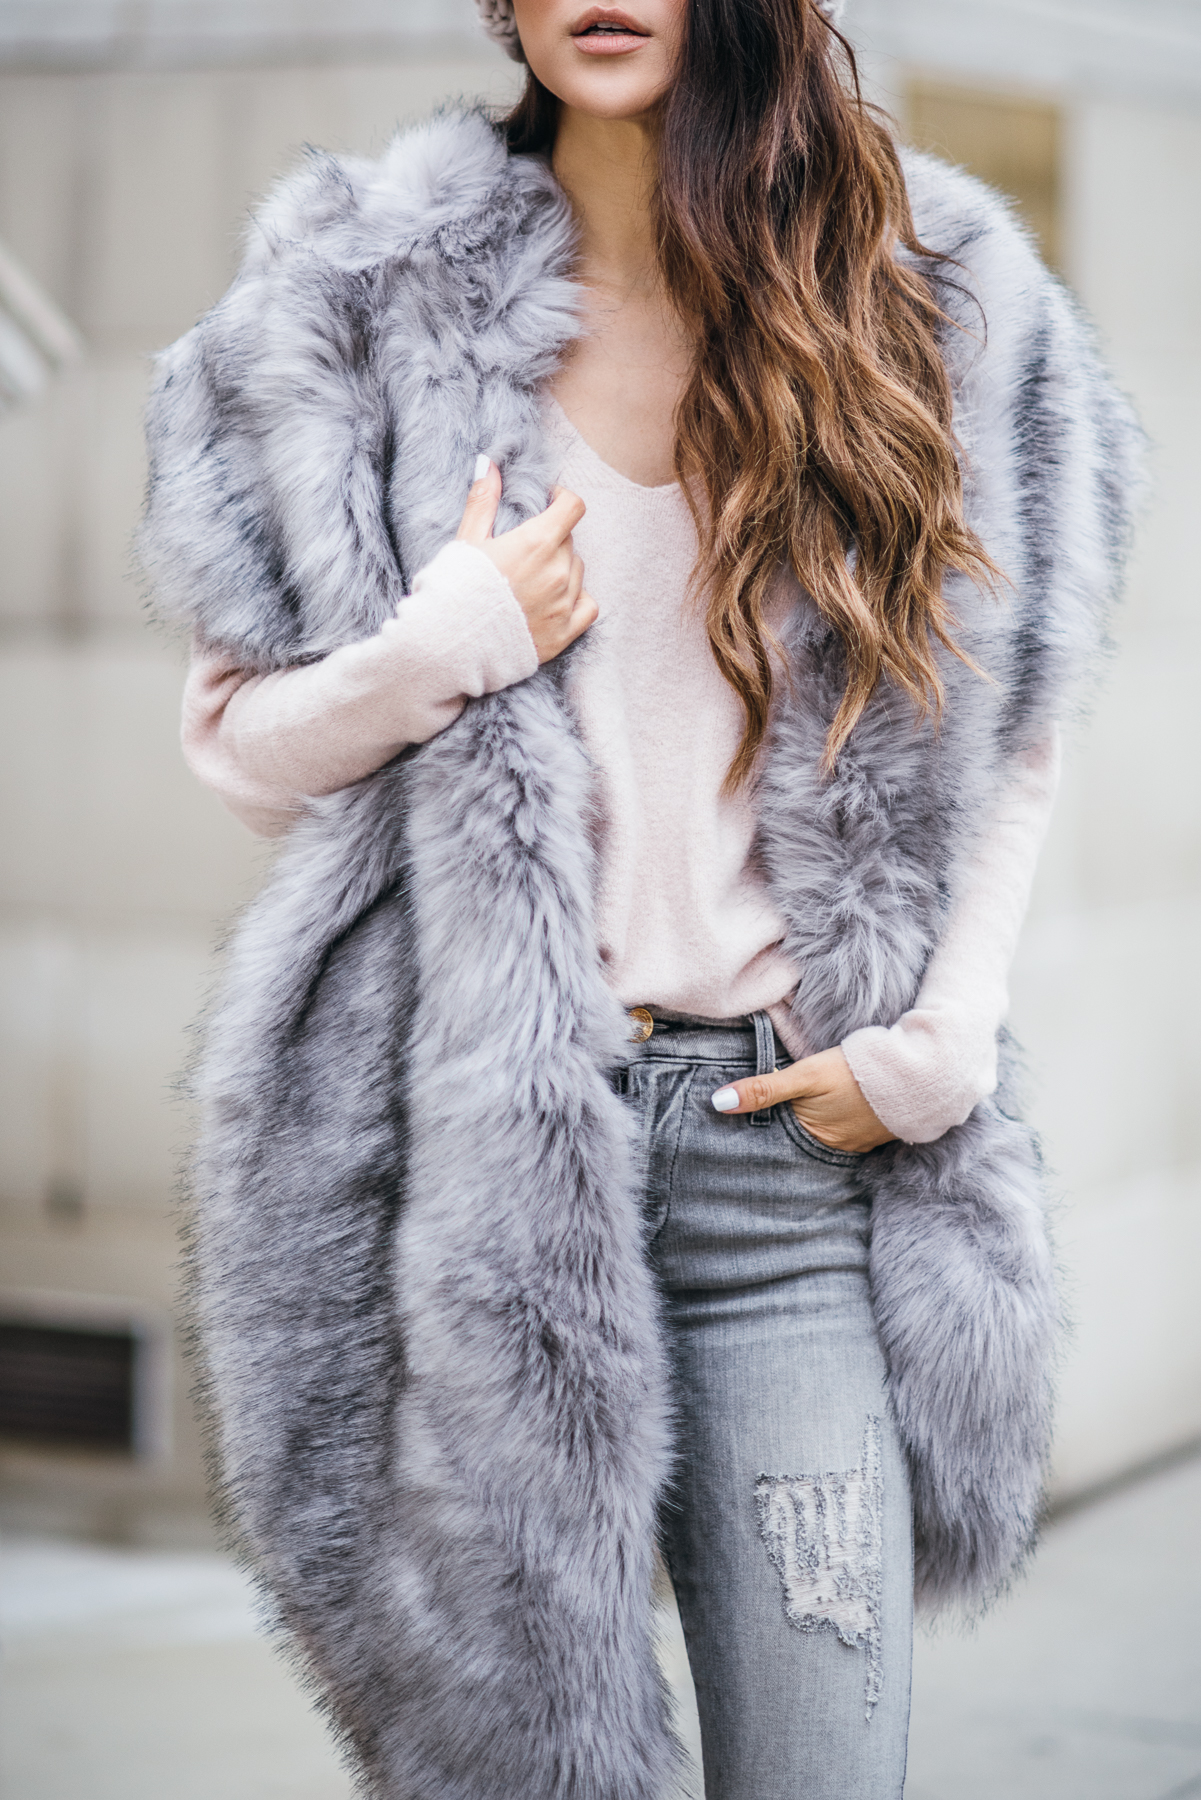 Faux Fur Stole - Chic Cold Weather Accessories // Notjessfashion.com